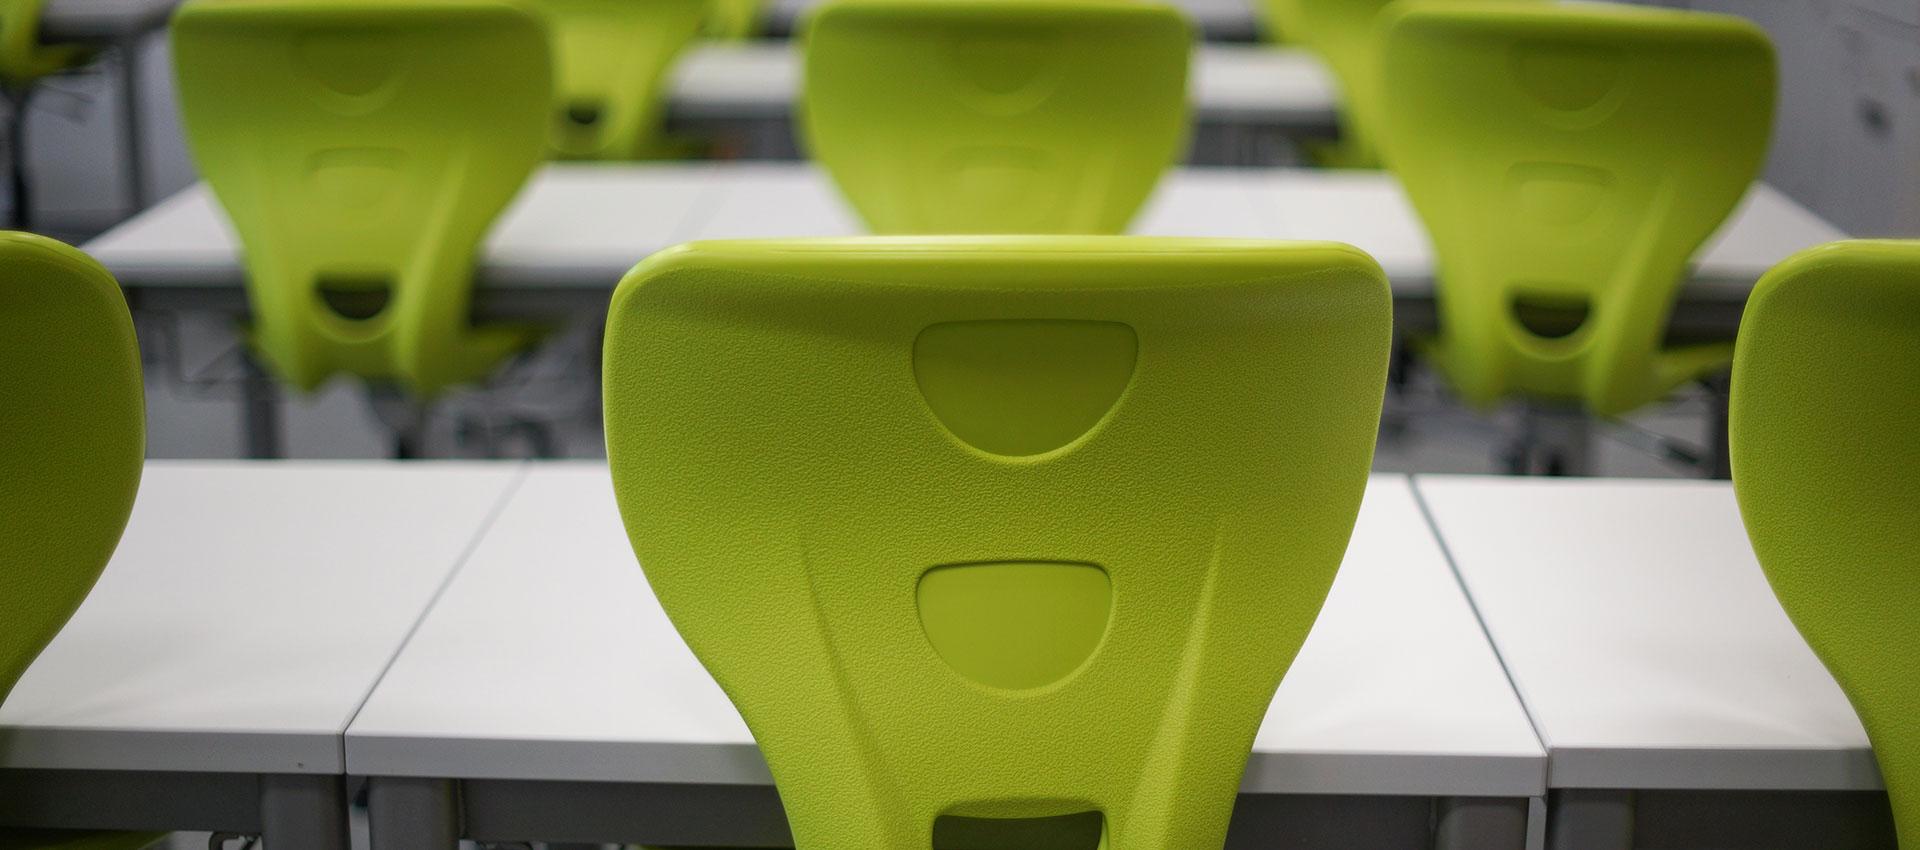 classroom-chairs